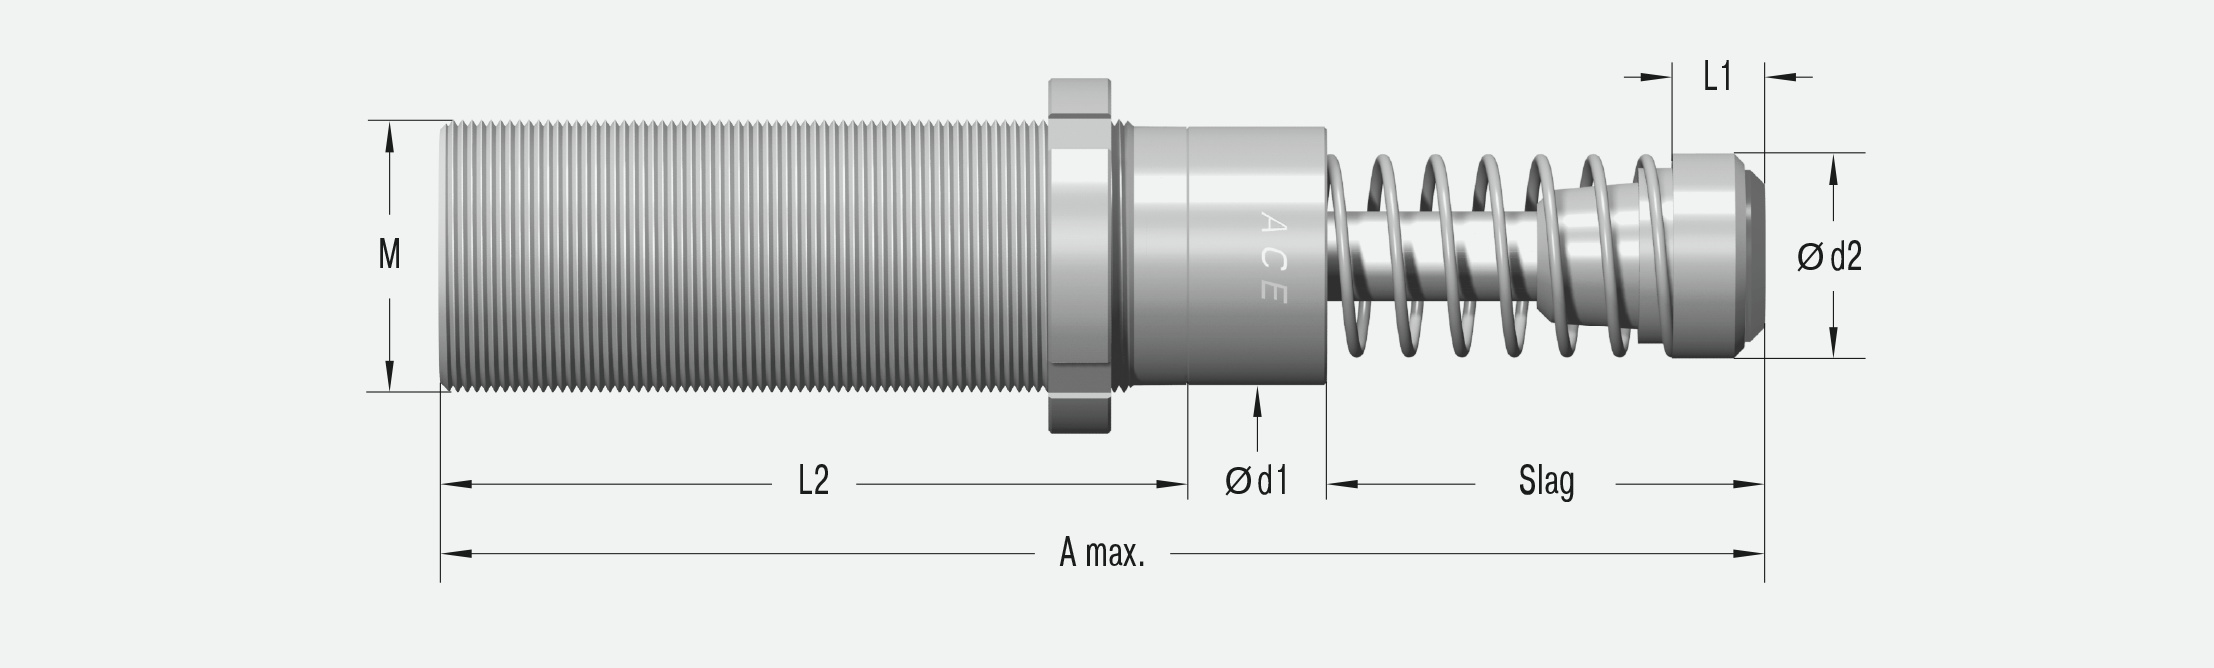 MC4550EUM-2-V4A